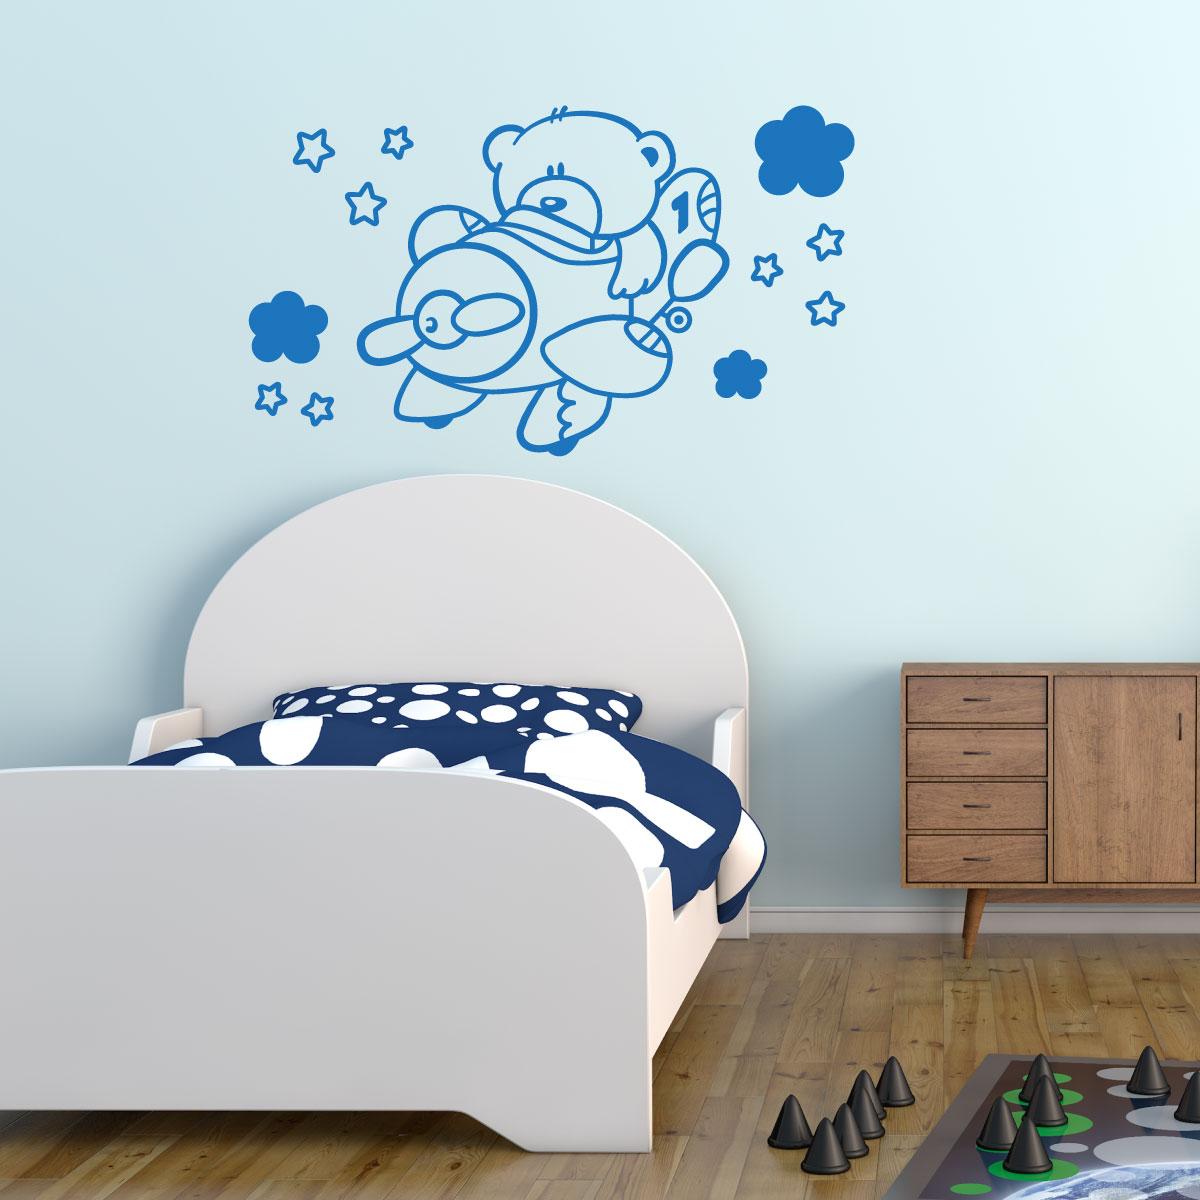 sticker ours dans un avion stickers chambre enfants chambre b b ambiance sticker. Black Bedroom Furniture Sets. Home Design Ideas